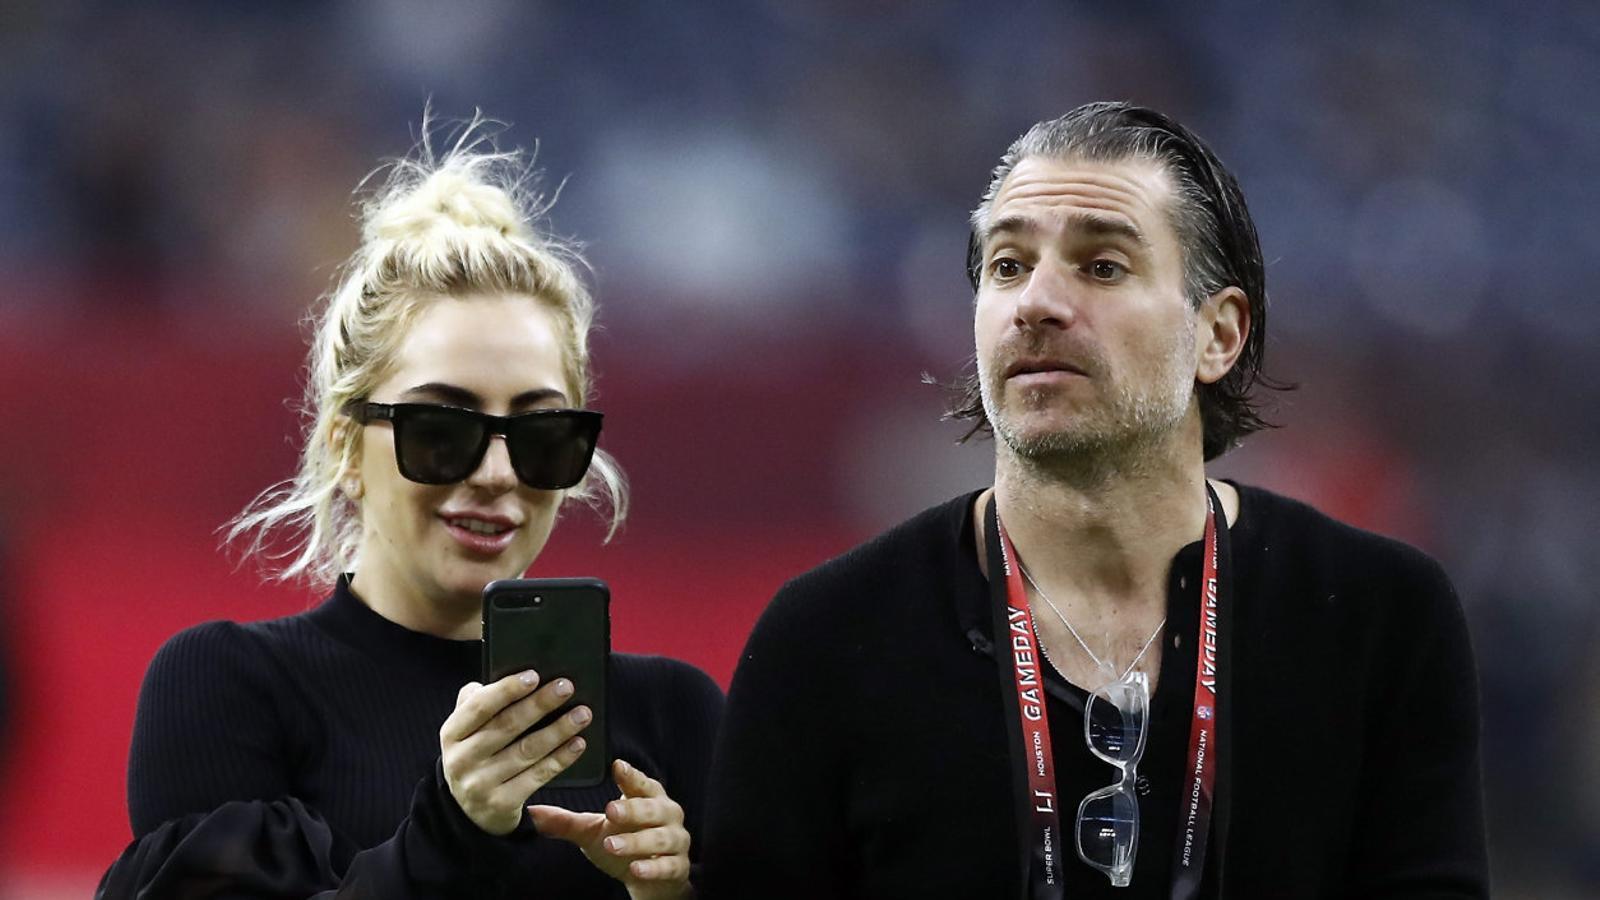 Christian Carino, el nou nòvio de Lady Gaga